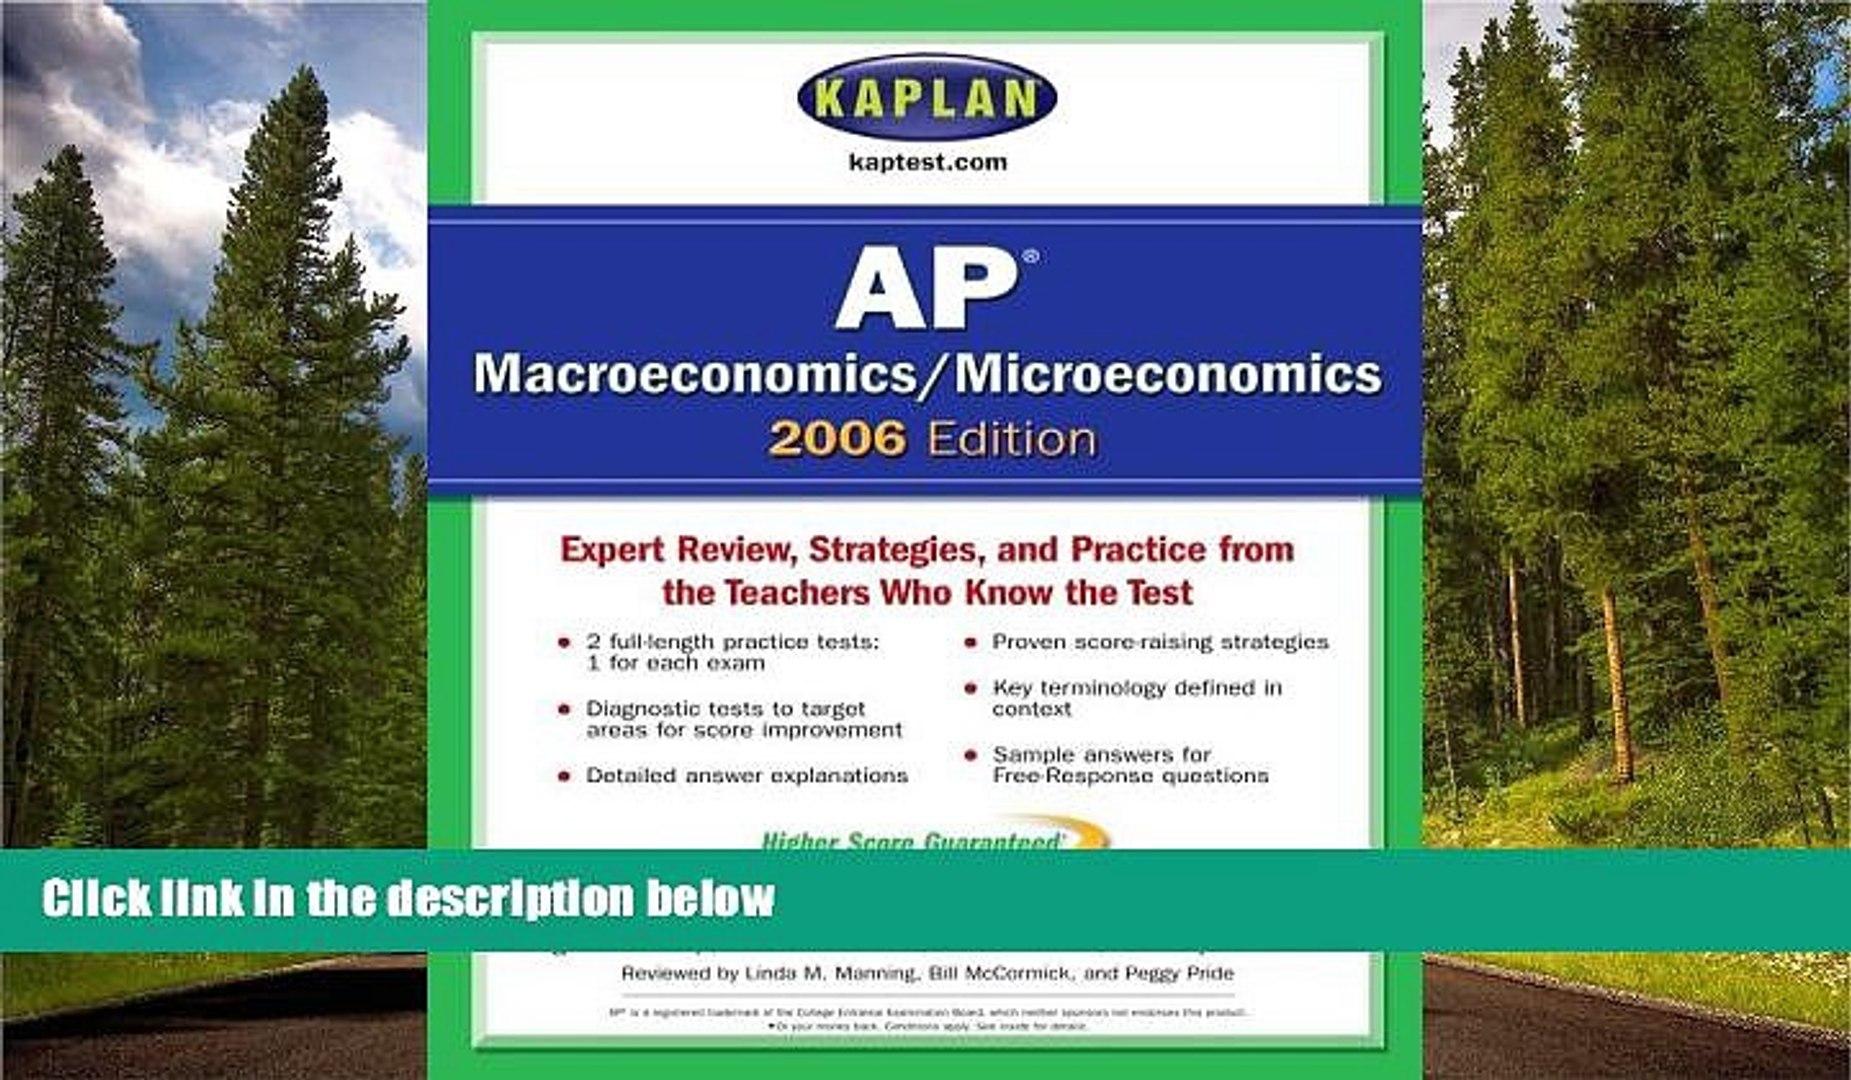 Enjoyed Read Kaplan AP Macroeconomics/Microeconomics 2006 Edition